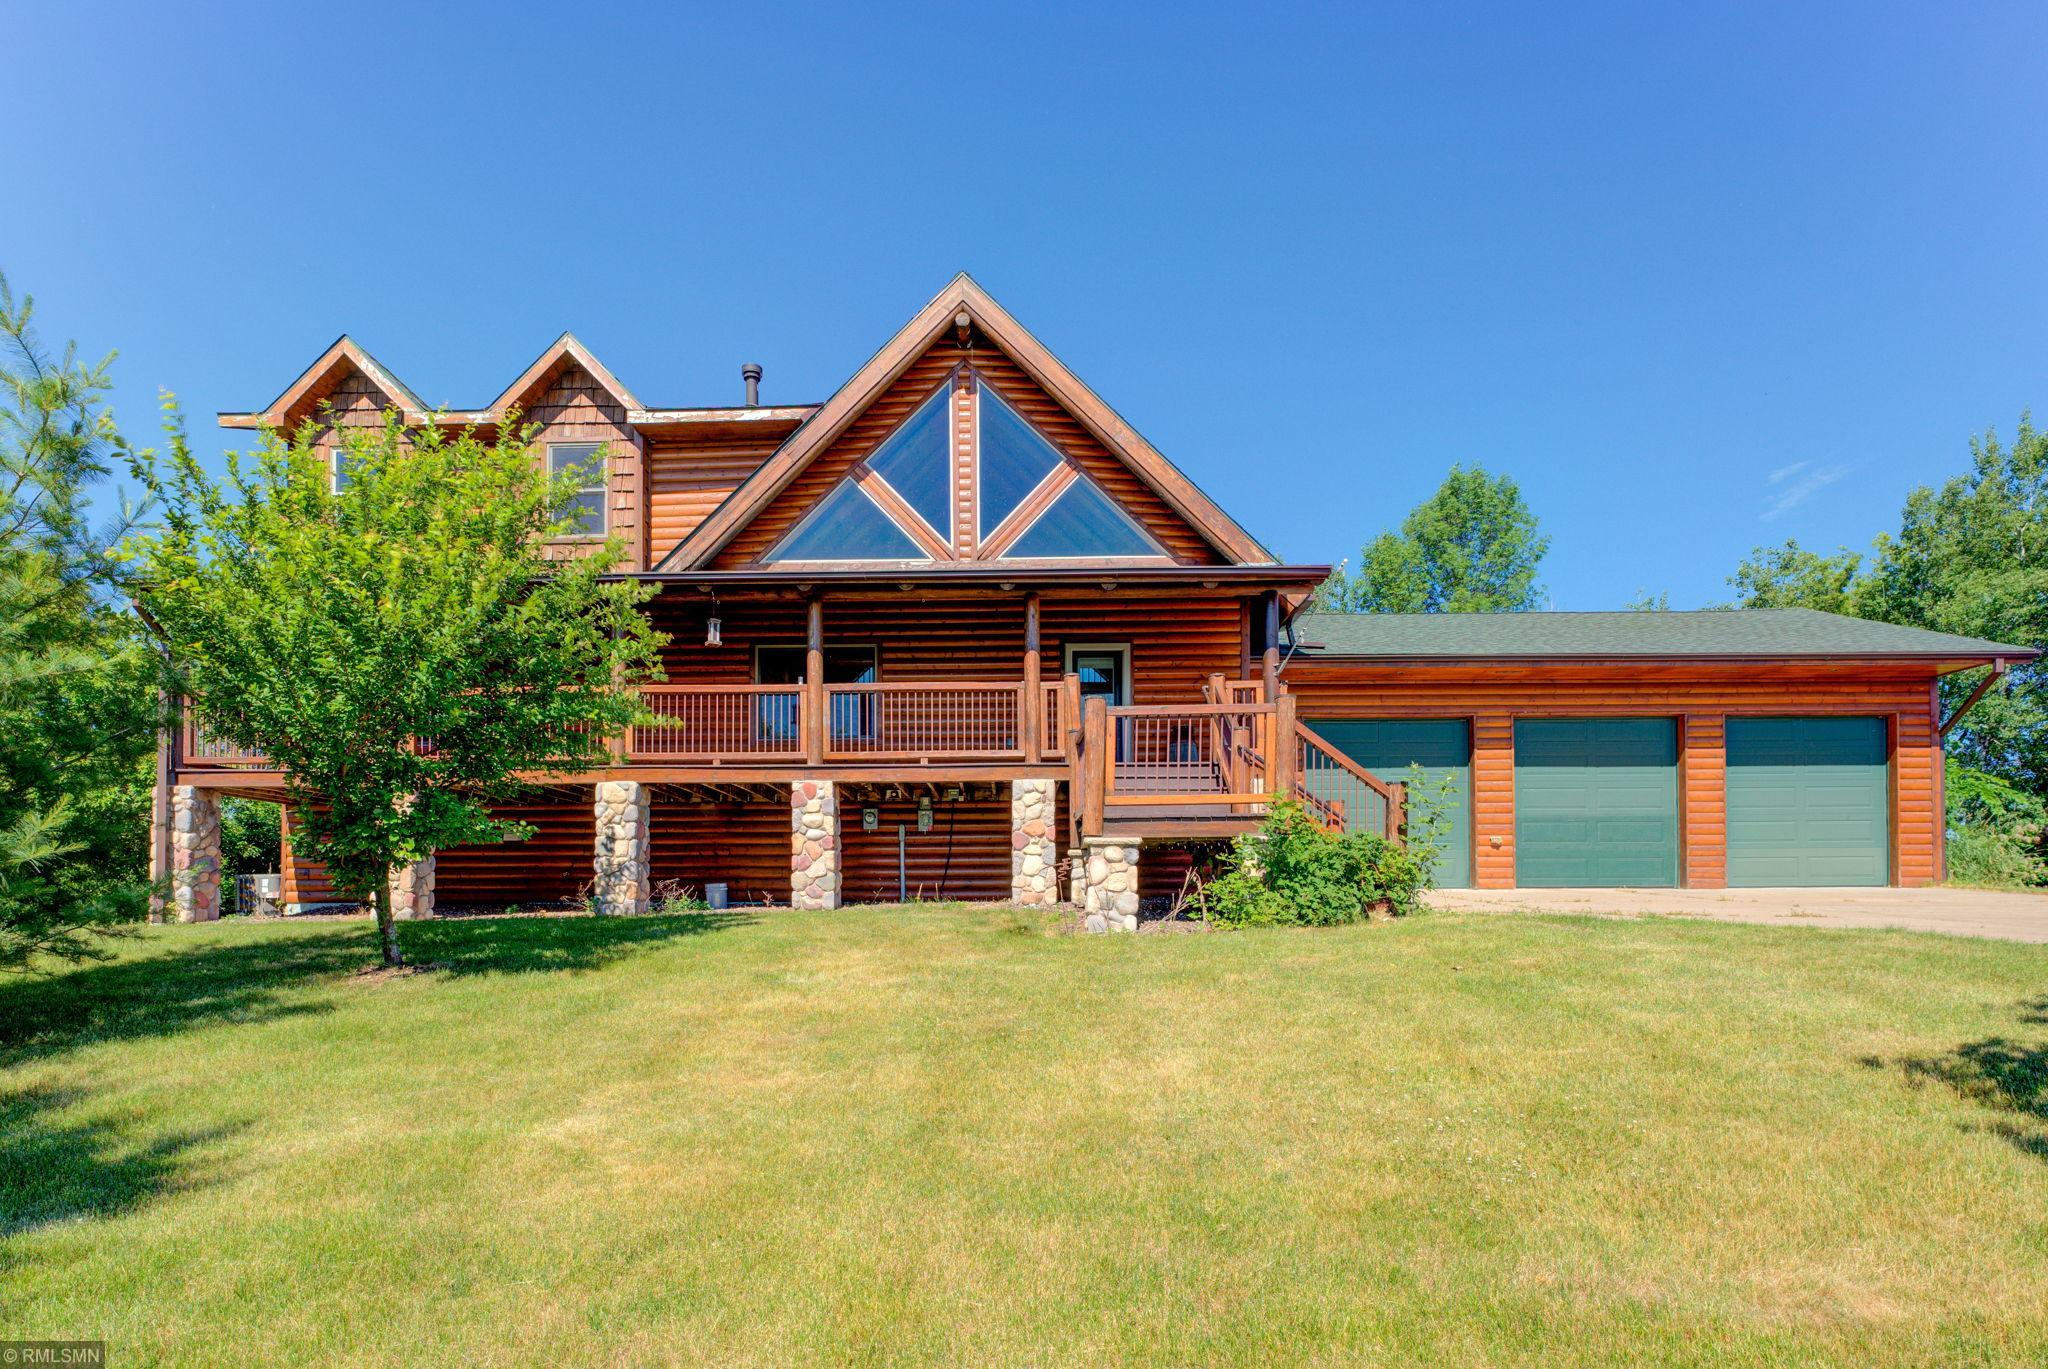 44950 Dapple Property Photo - Fish Lake Twp, MN real estate listing